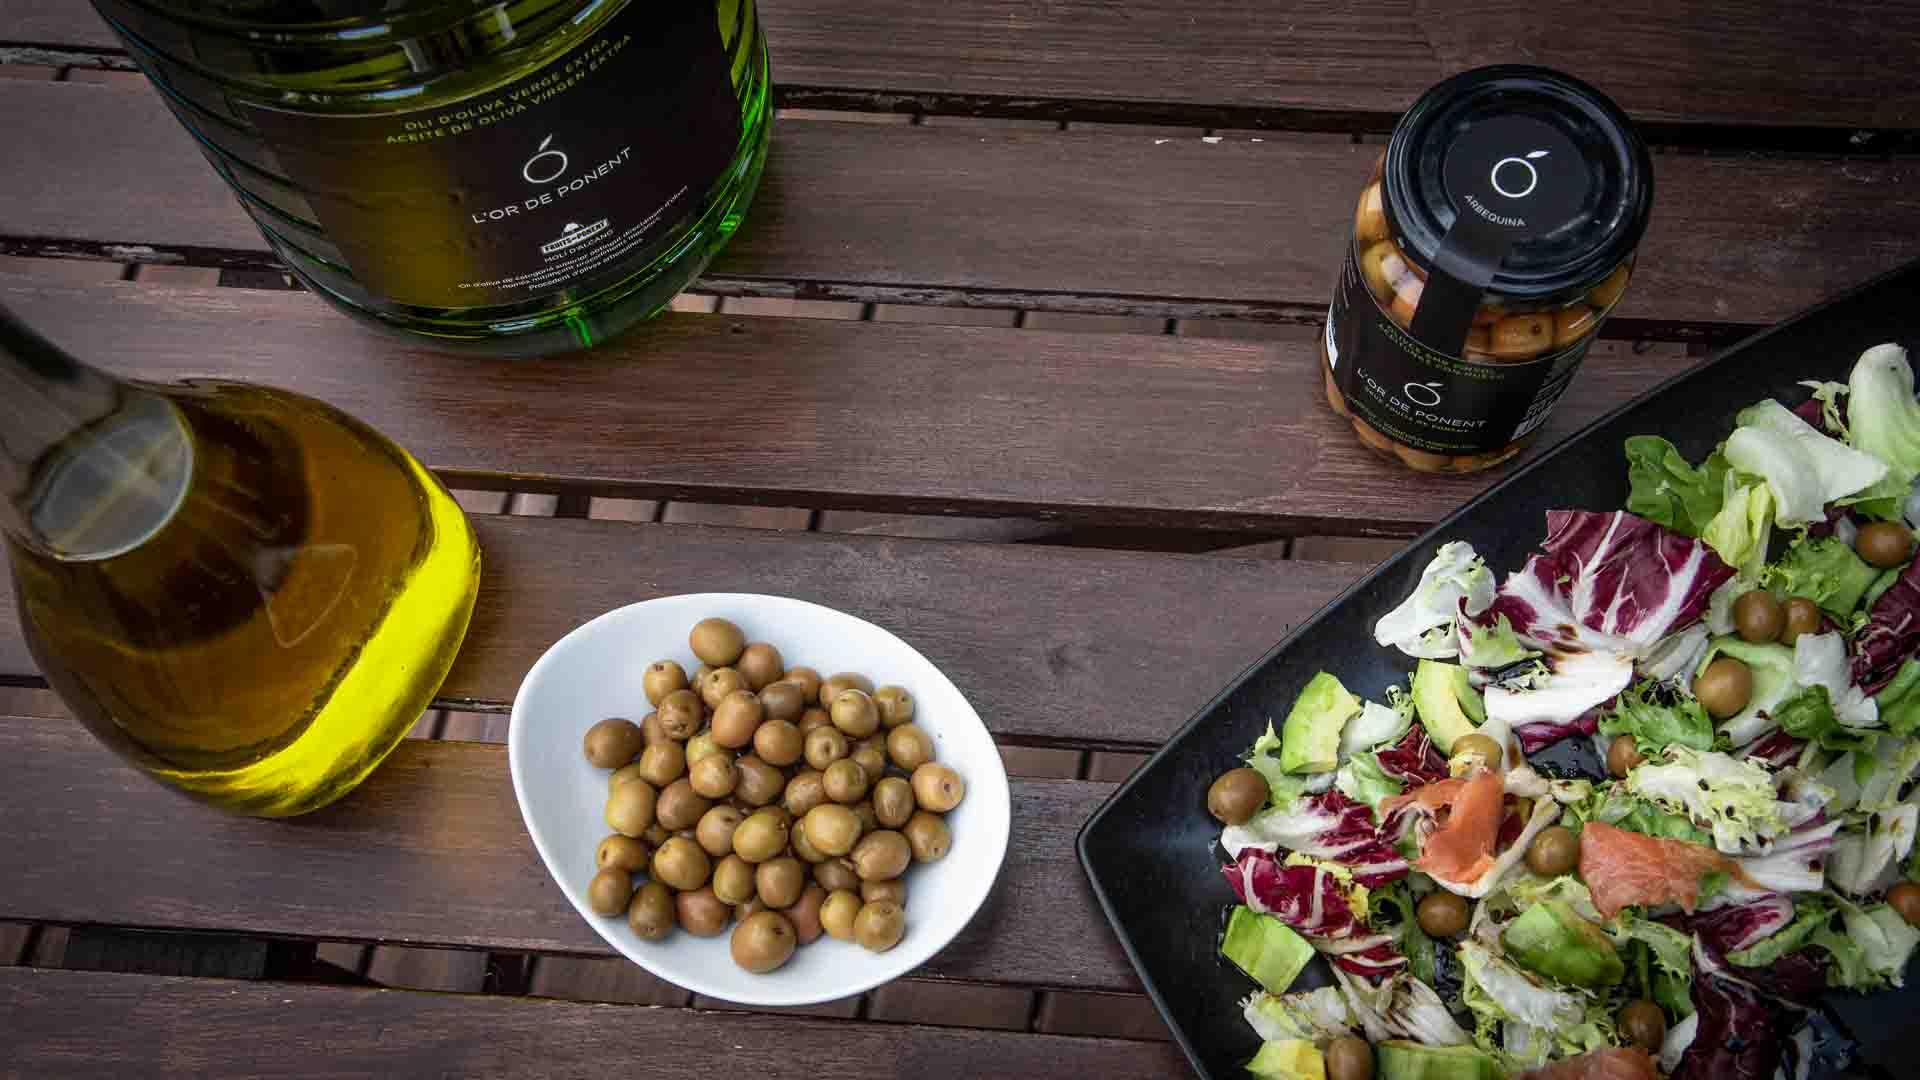 olives arbequines l'Or de Ponent